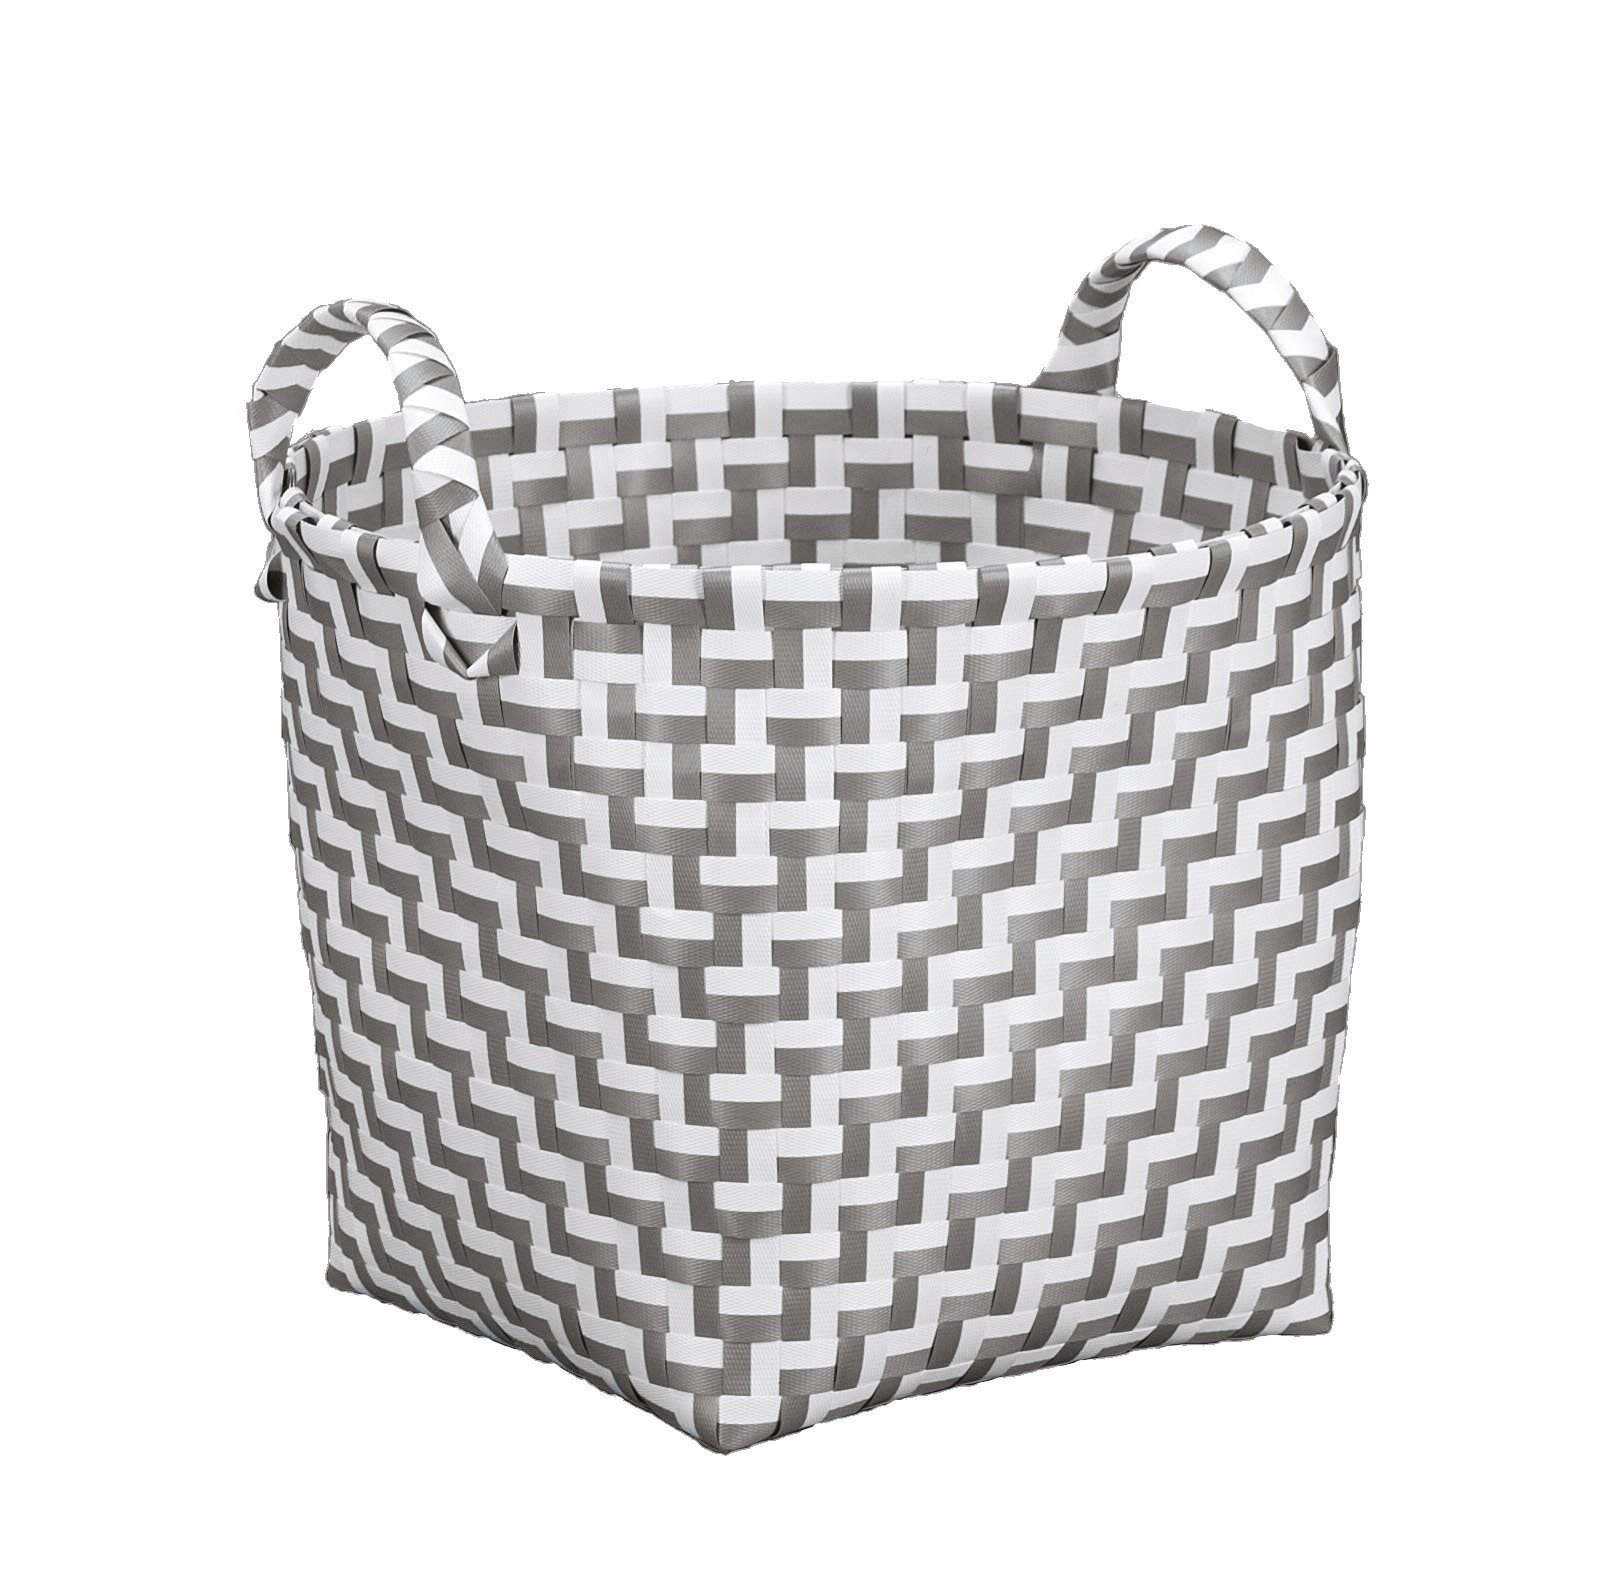 Korb Double Basket Platin B:30cm